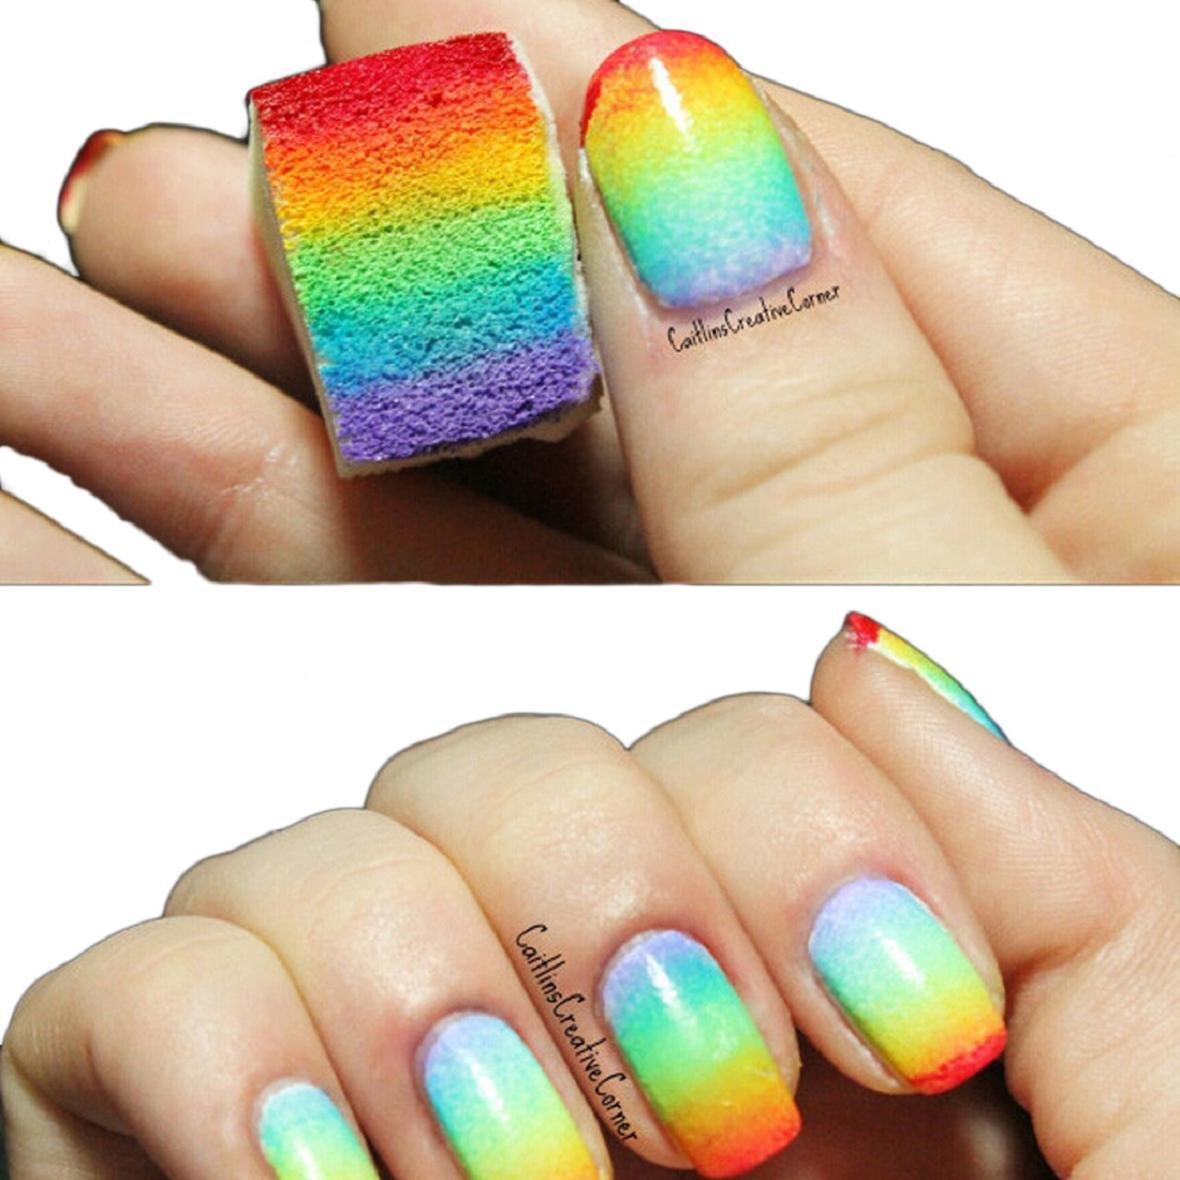 Cheap Diy Manicure, find Diy Manicure deals on line at Alibaba.com